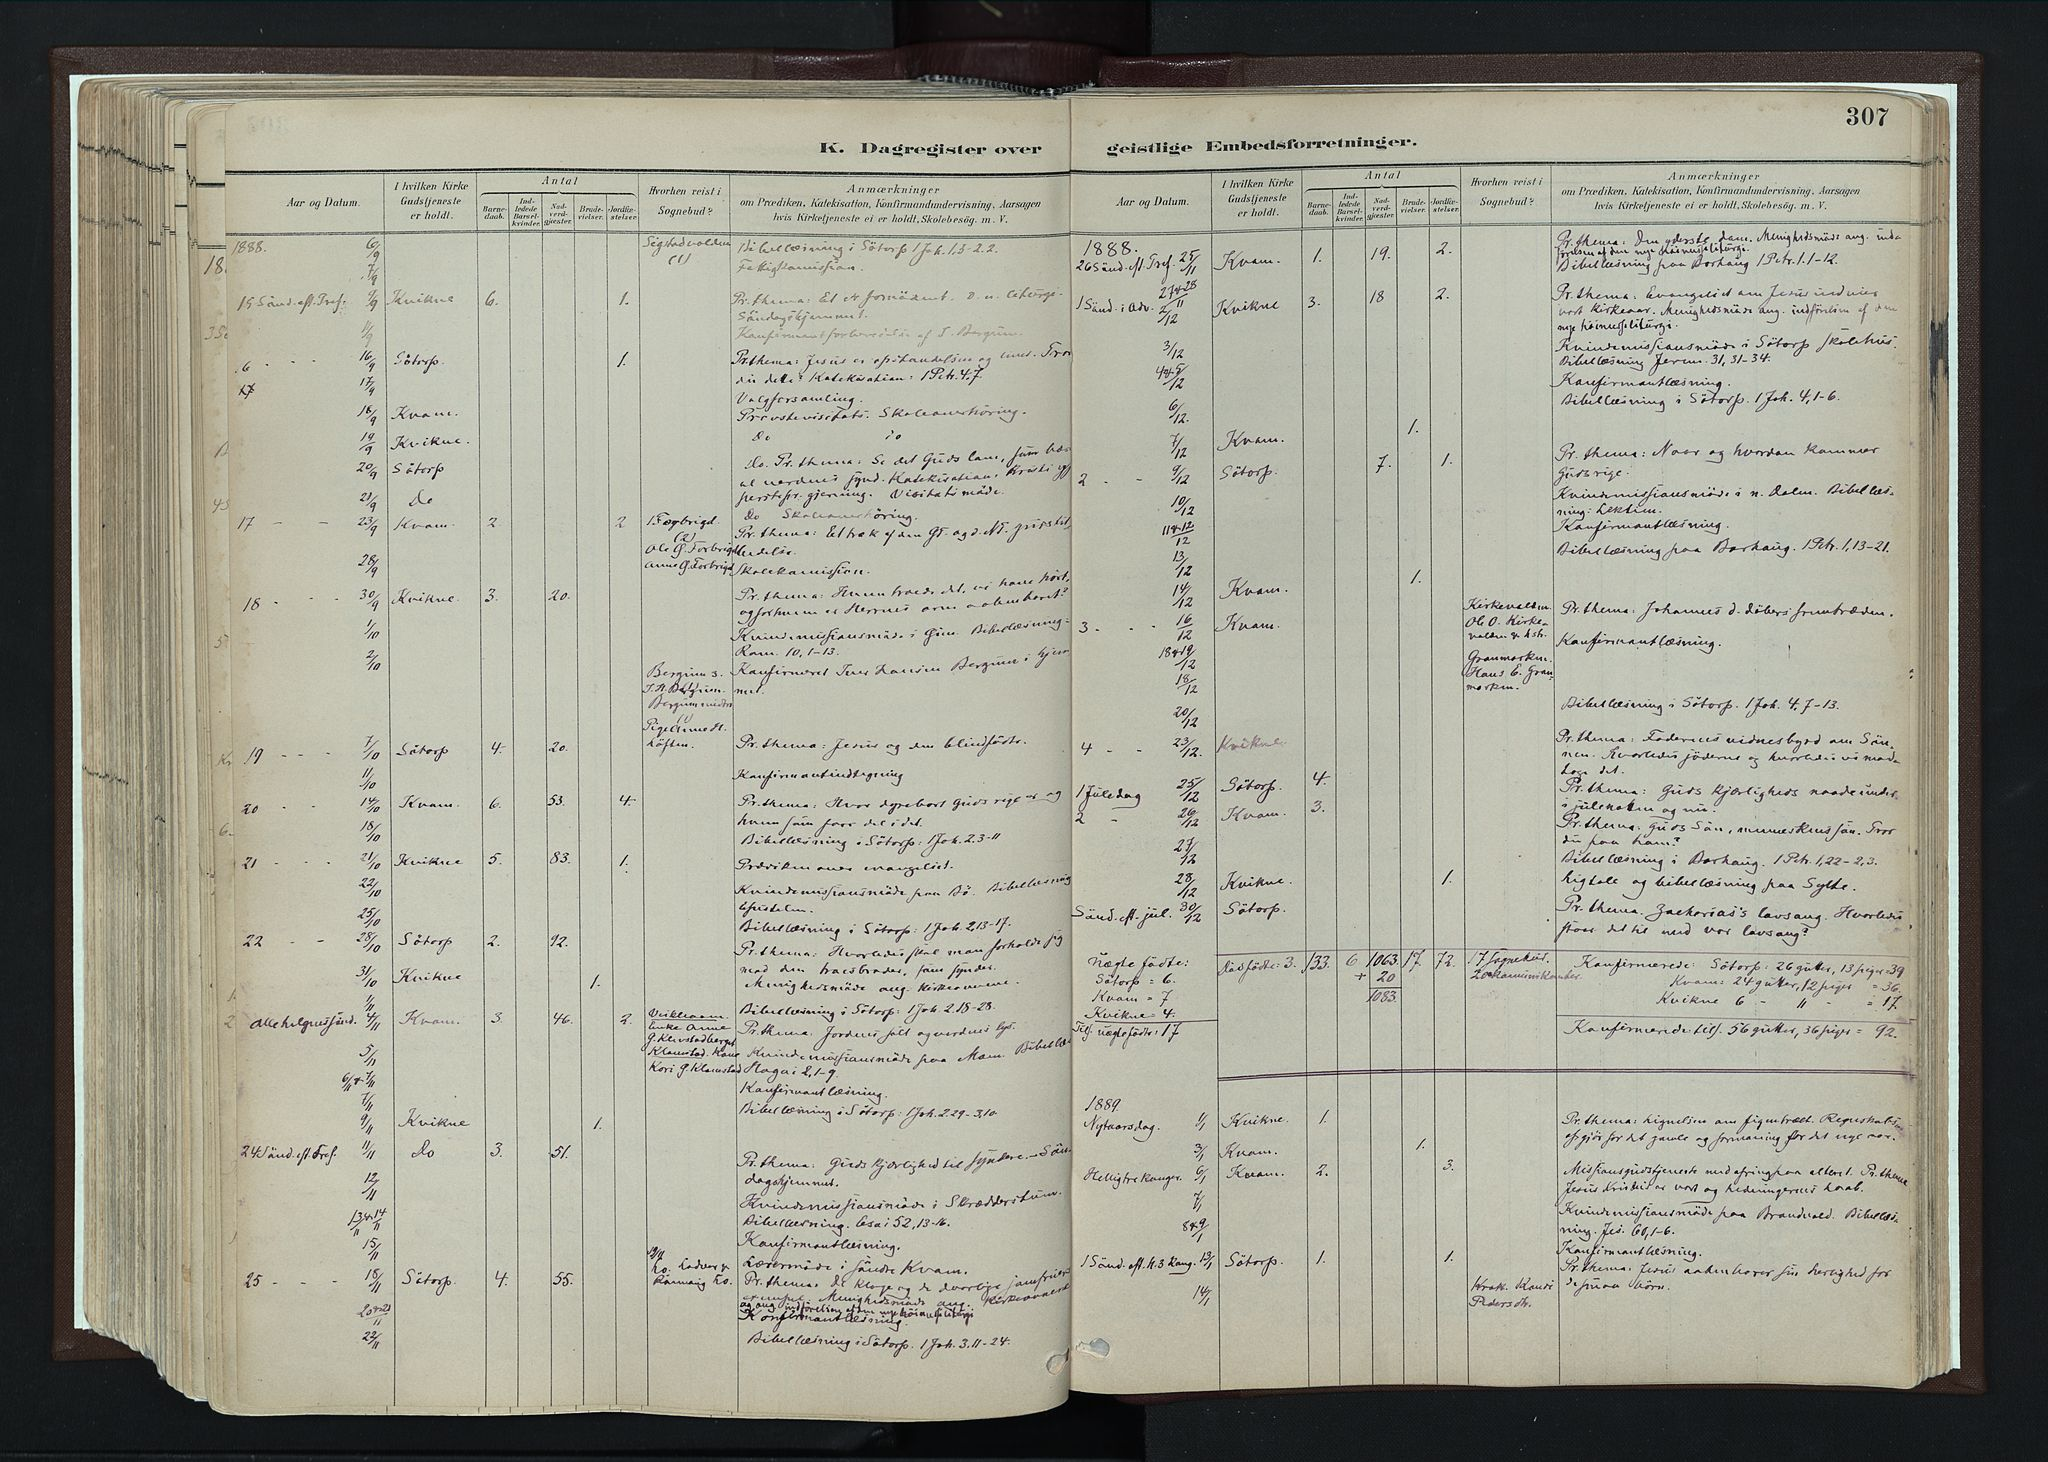 SAH, Nord-Fron prestekontor, Ministerialbok nr. 4, 1884-1914, s. 307